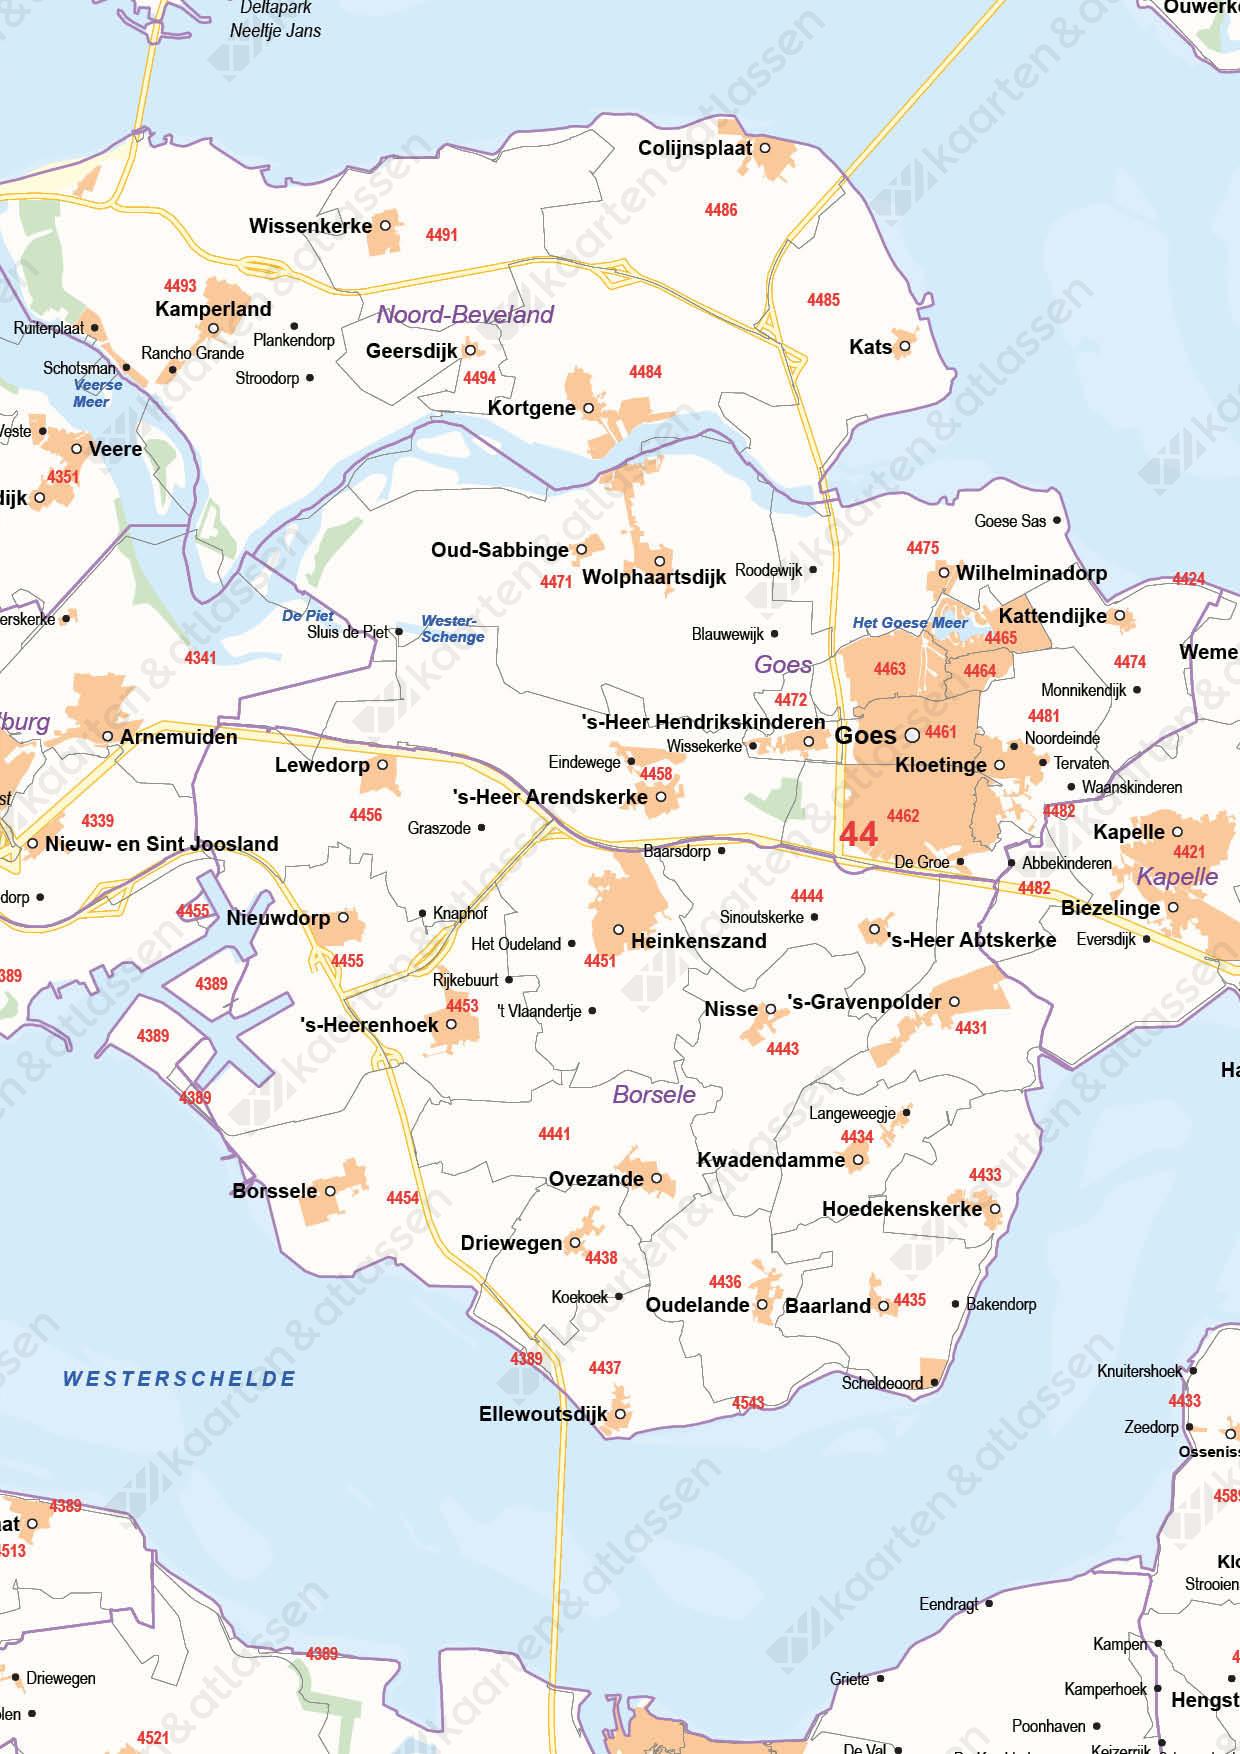 Postcode-/Gemeentekaart Zeeland